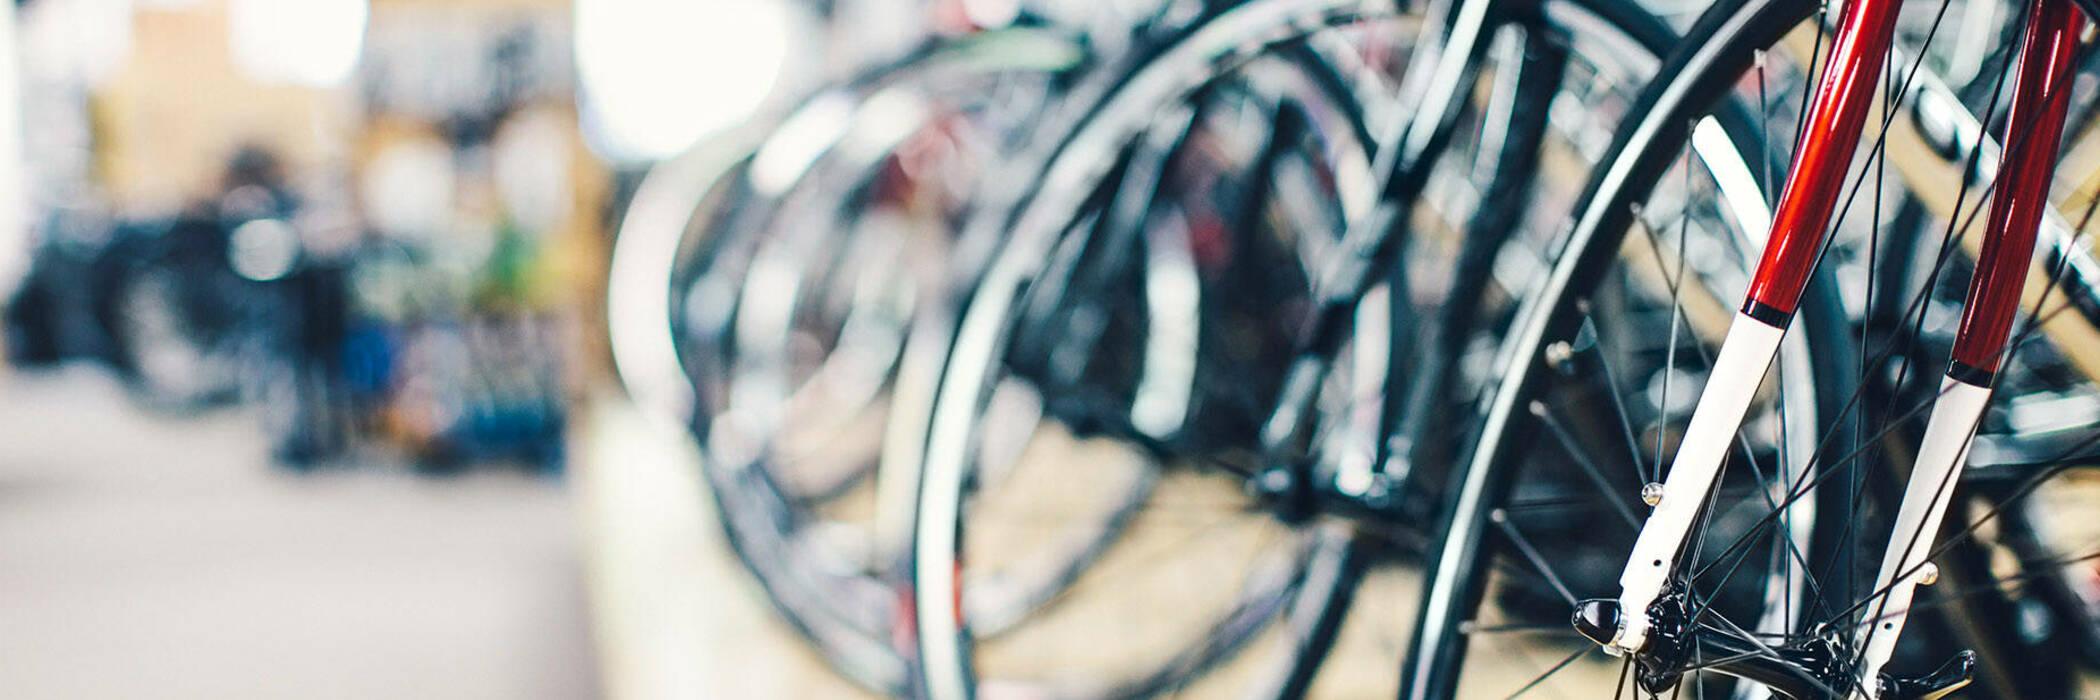 17feb bike barn hero